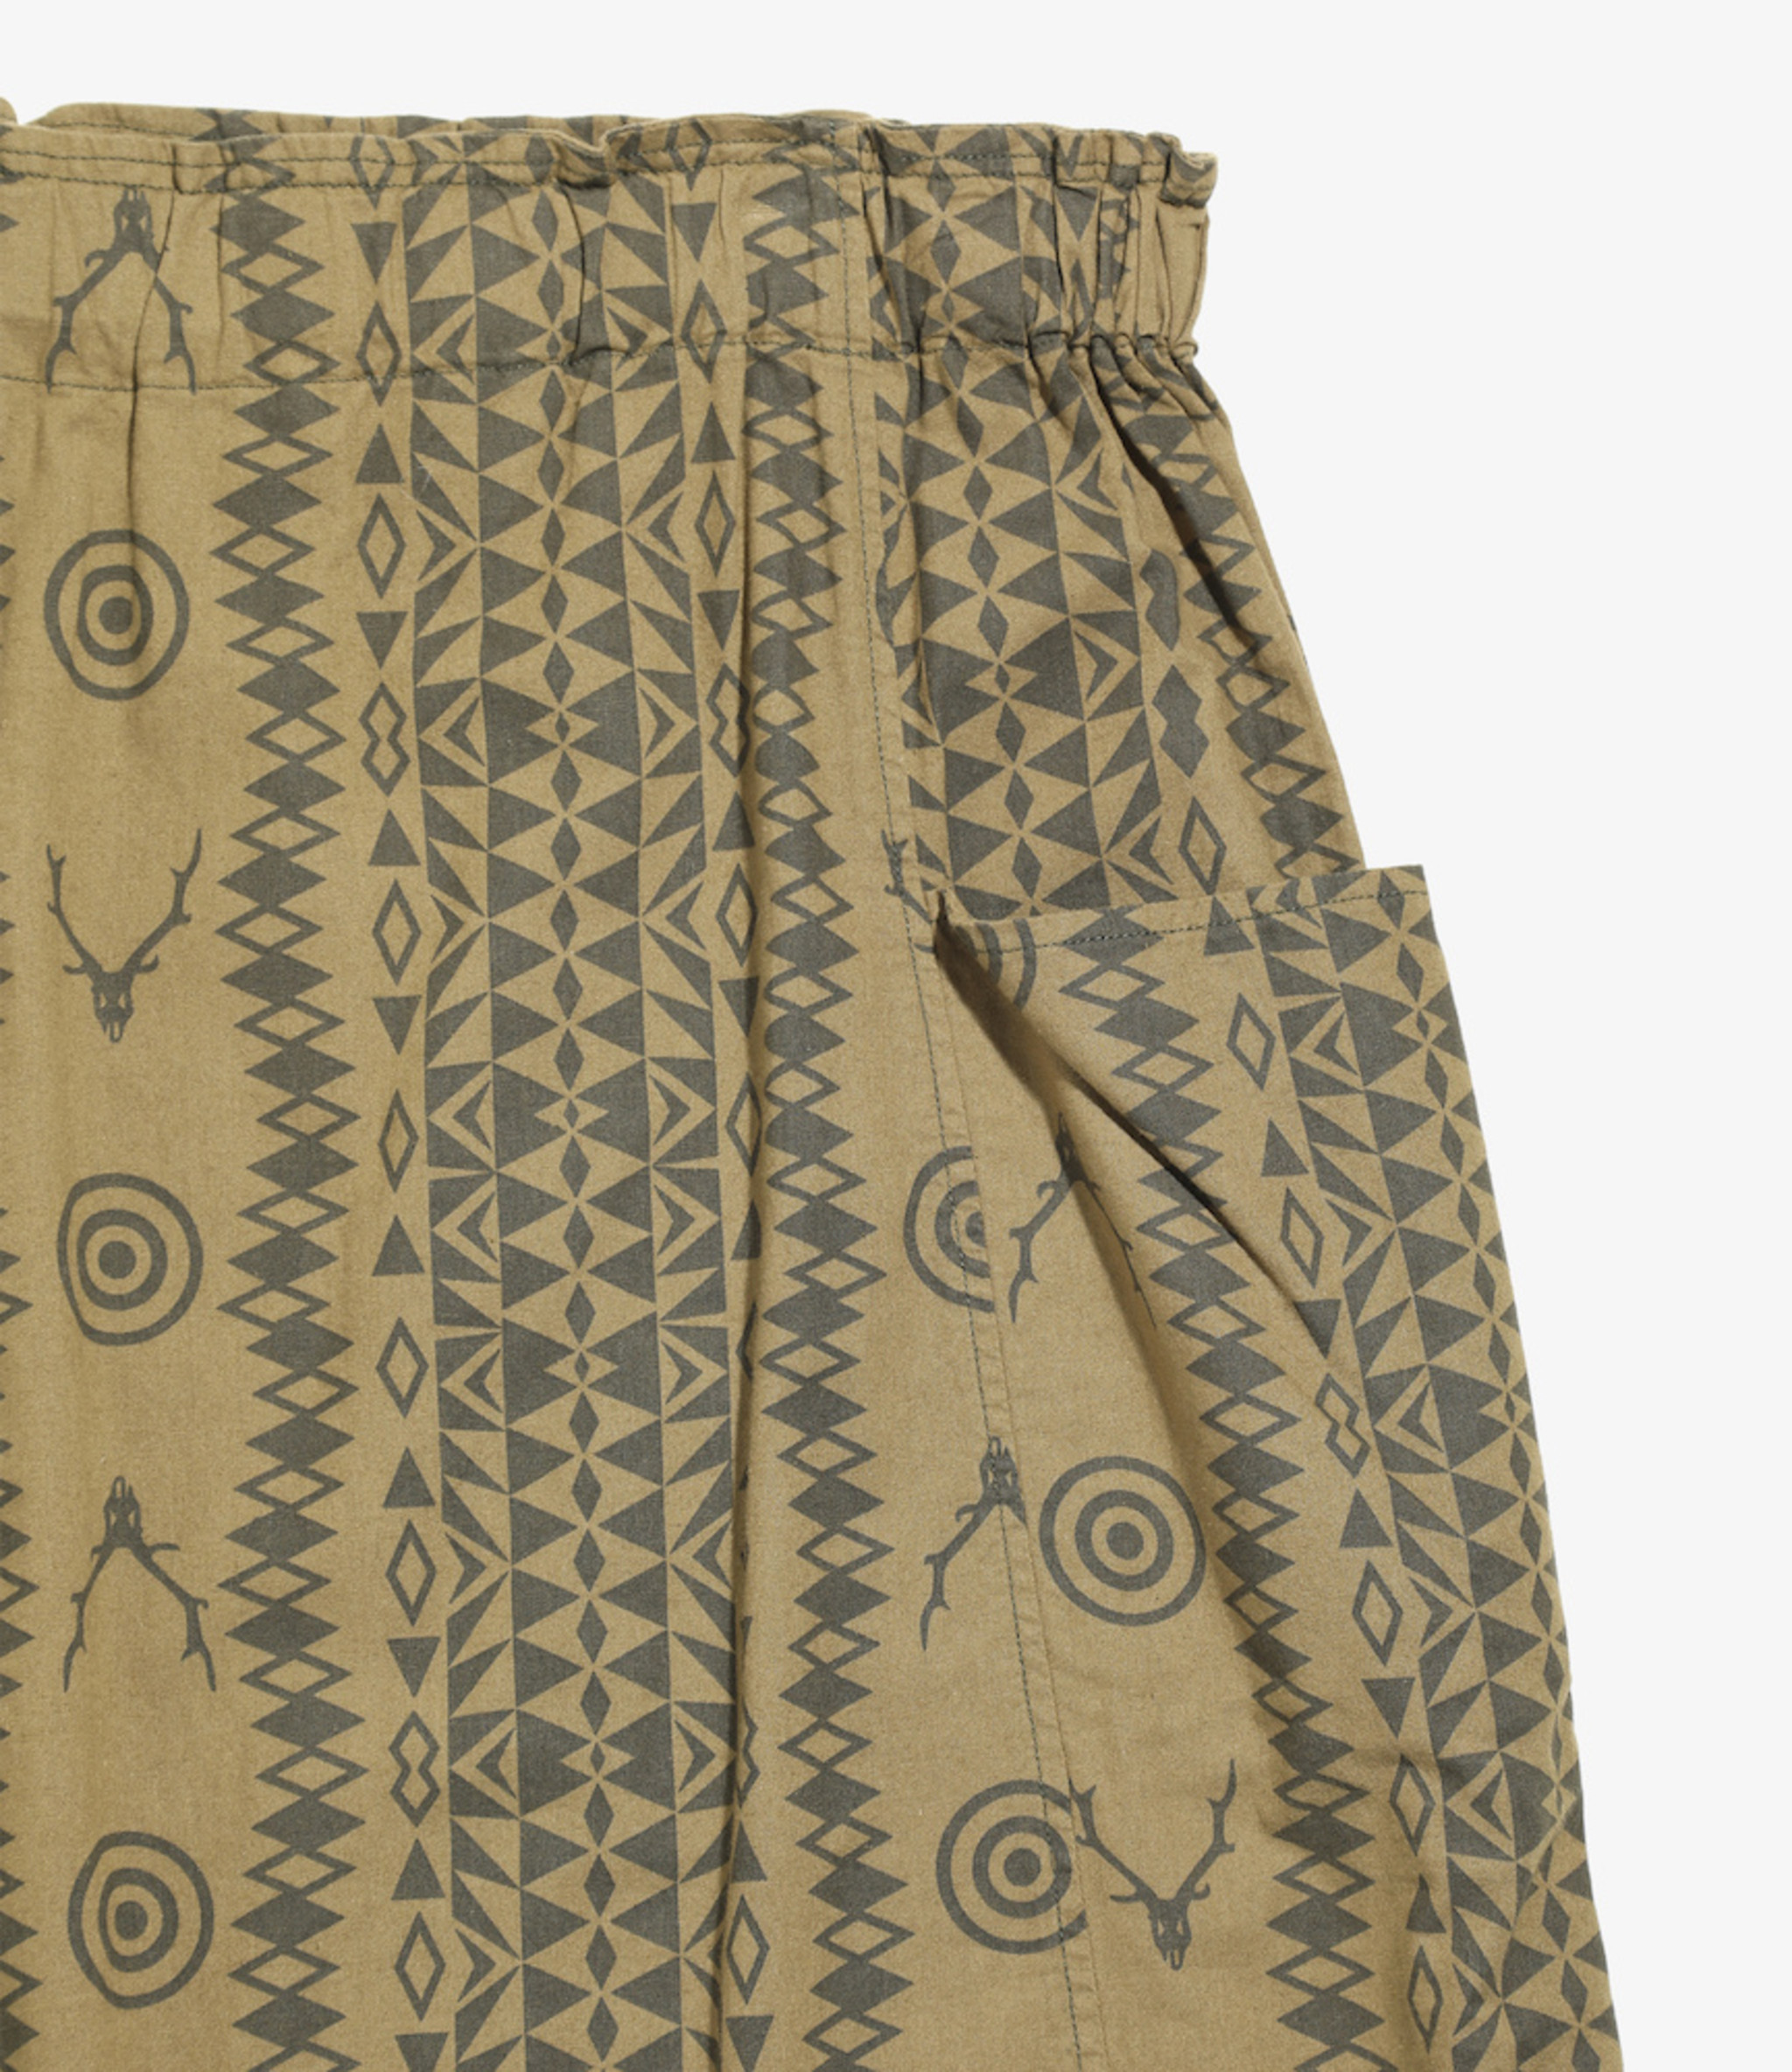 South2 West8 Army String Skirt - Flannel Pt  - Skull&Target